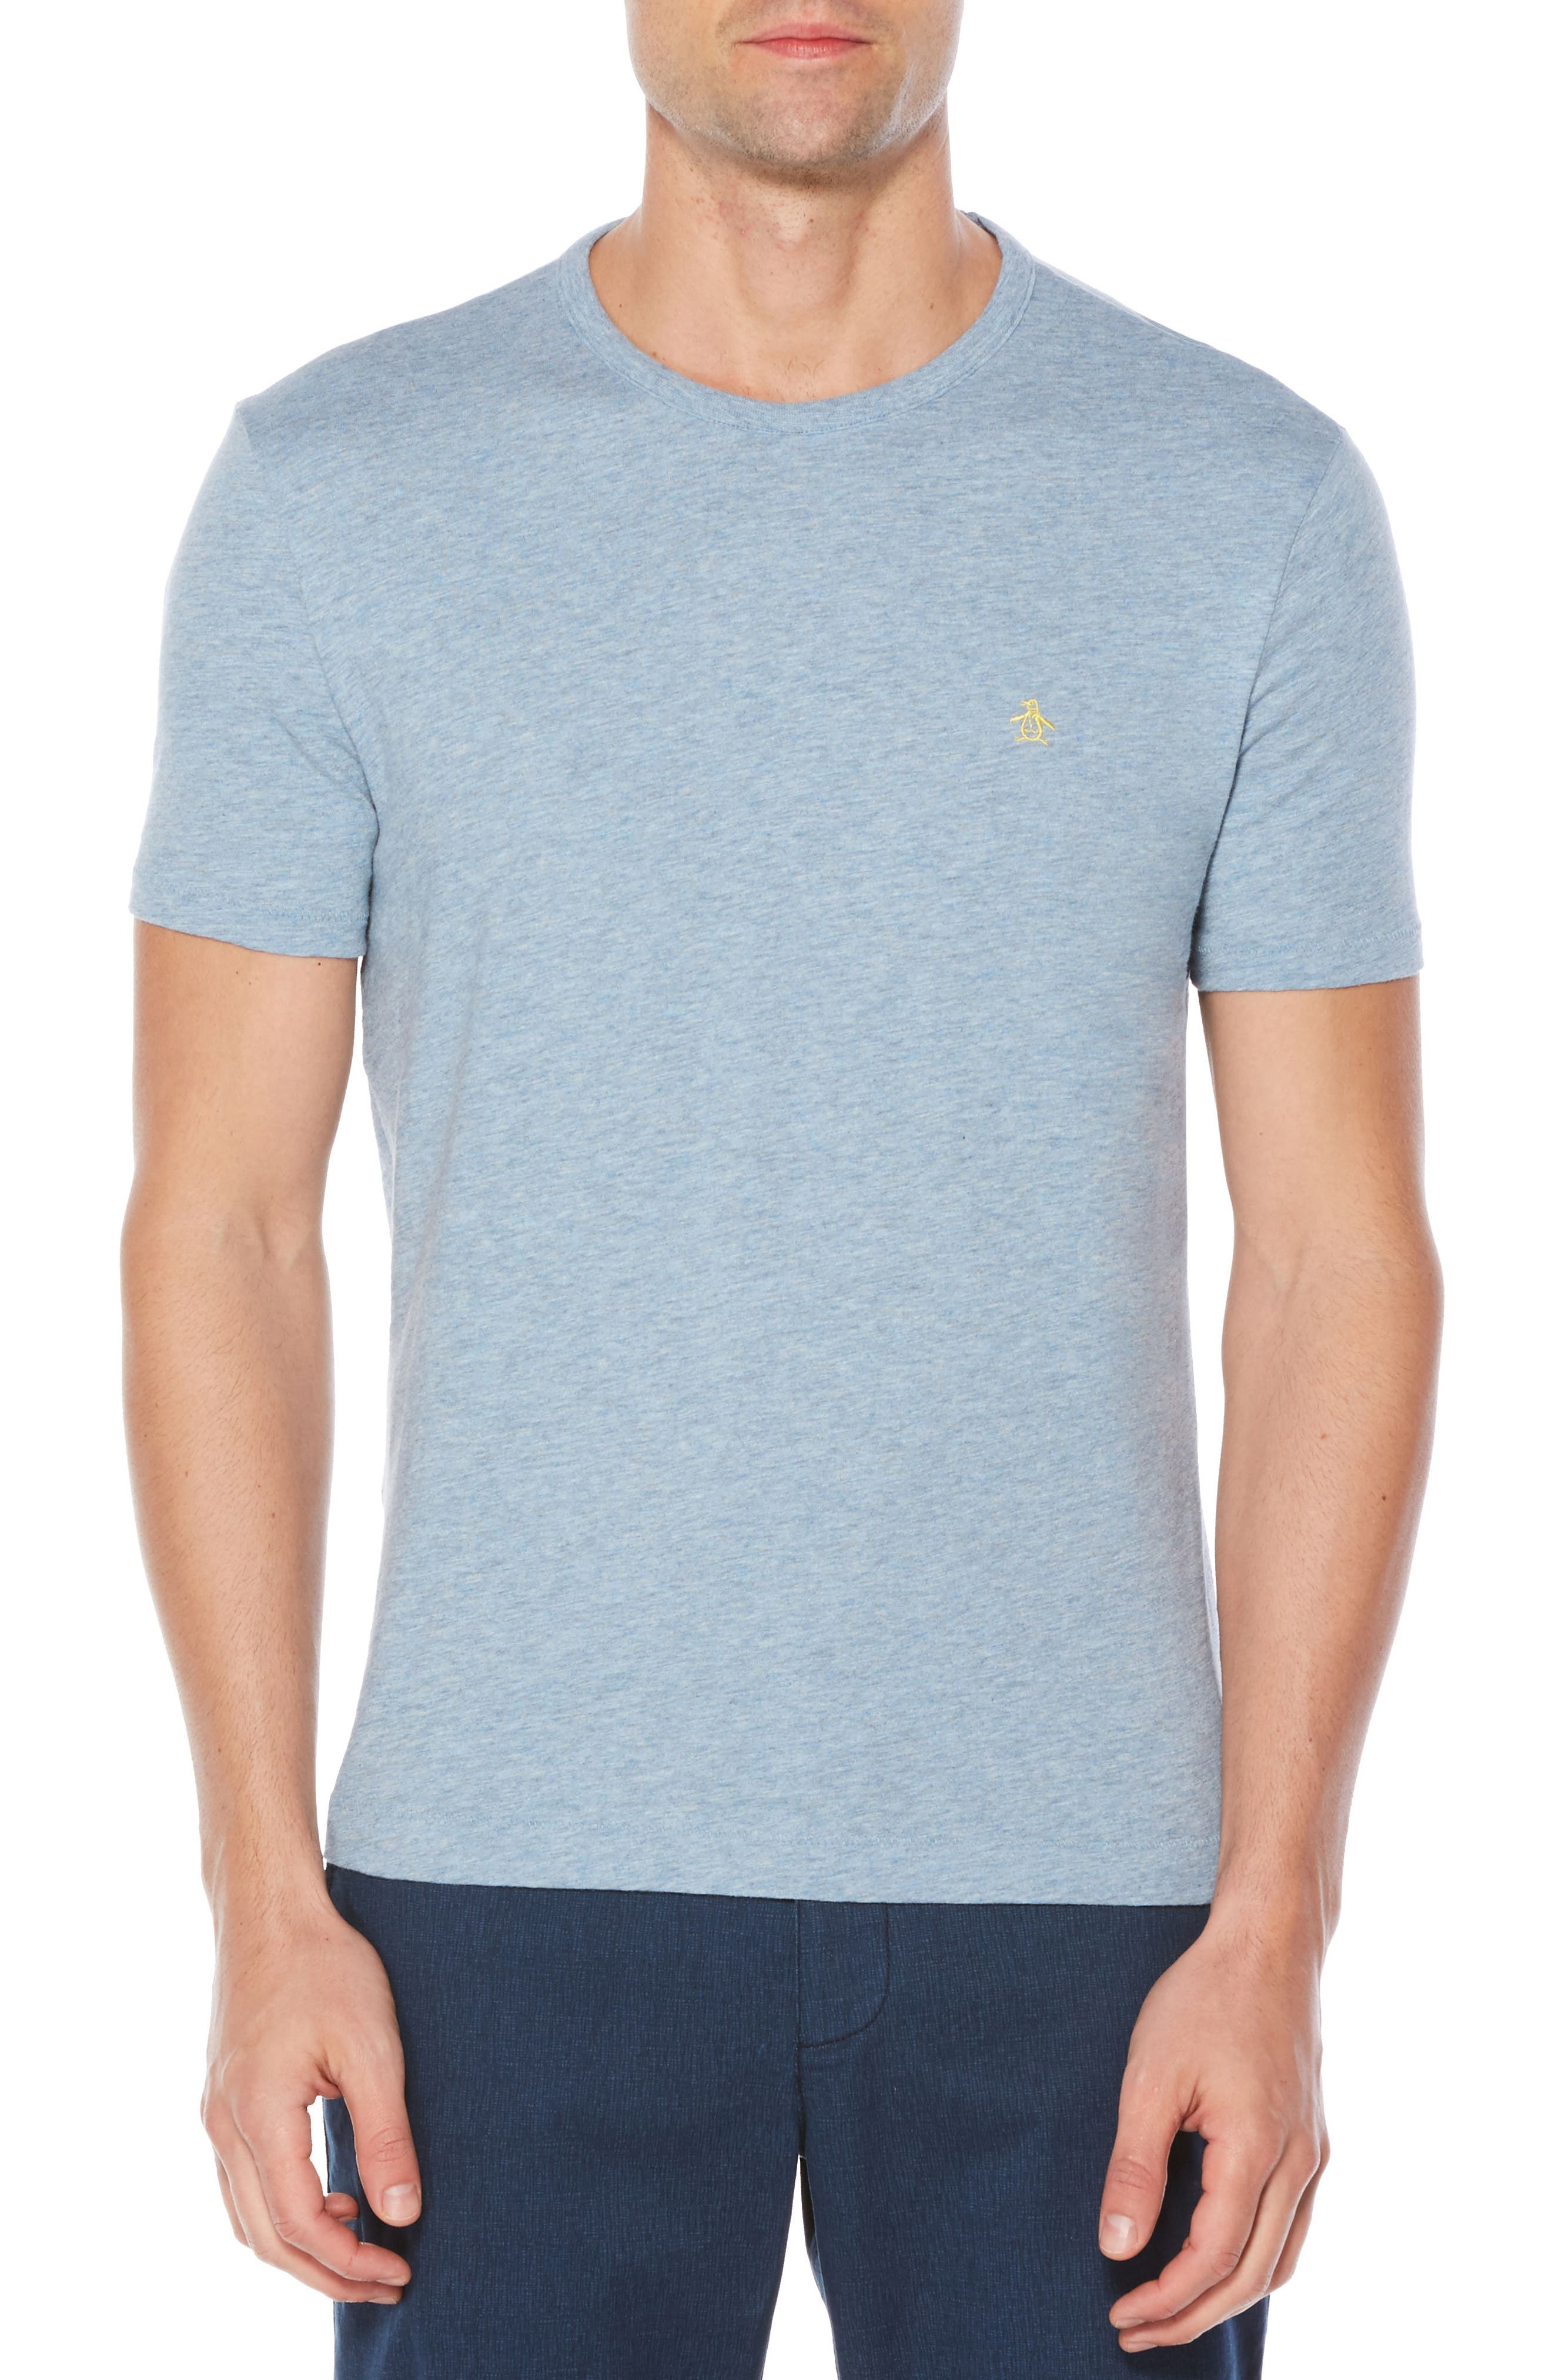 Alternate Image 1 Selected - Original Penguin Slub Cotton T-Shirt